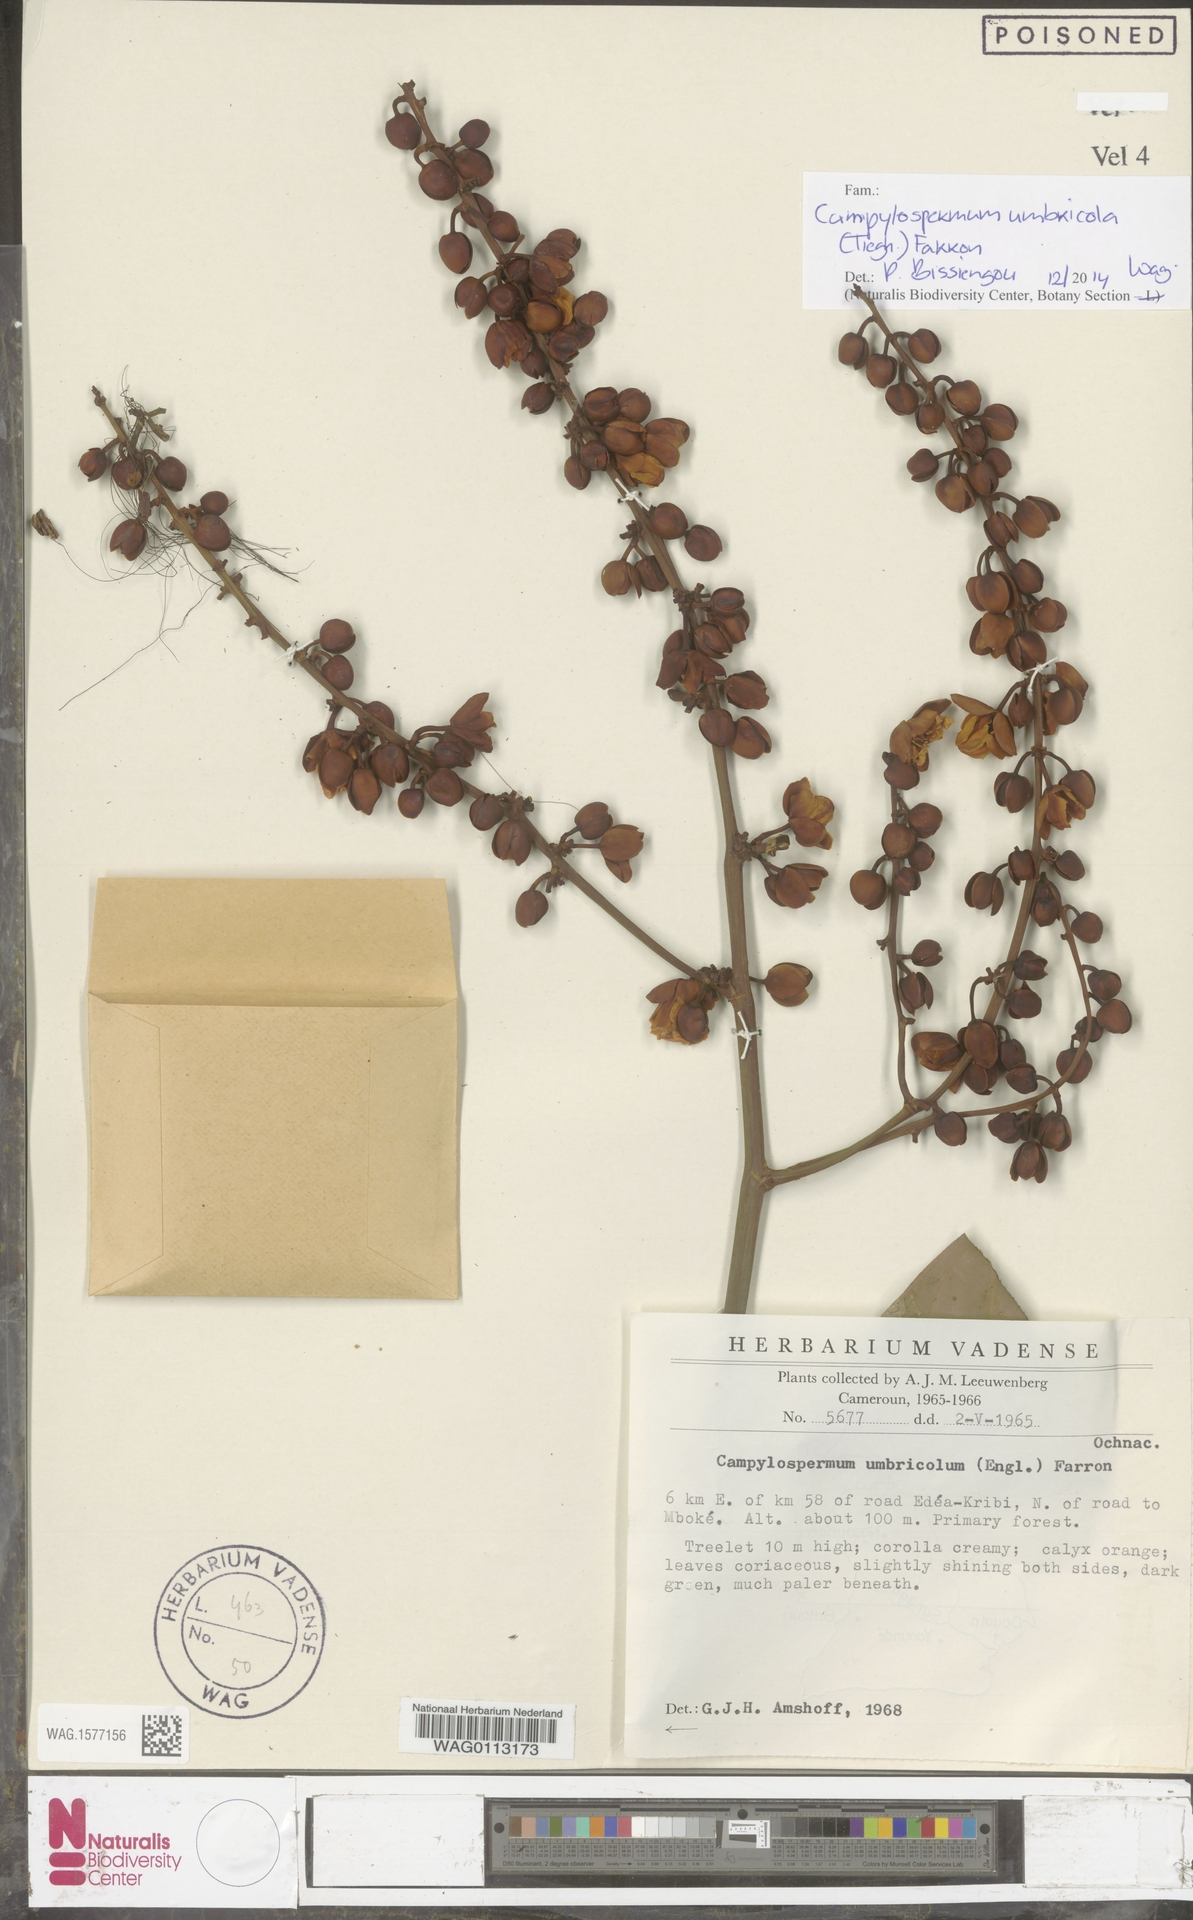 WAG.1577156 | Campylospermum umbricola (Tiegh.) Farron